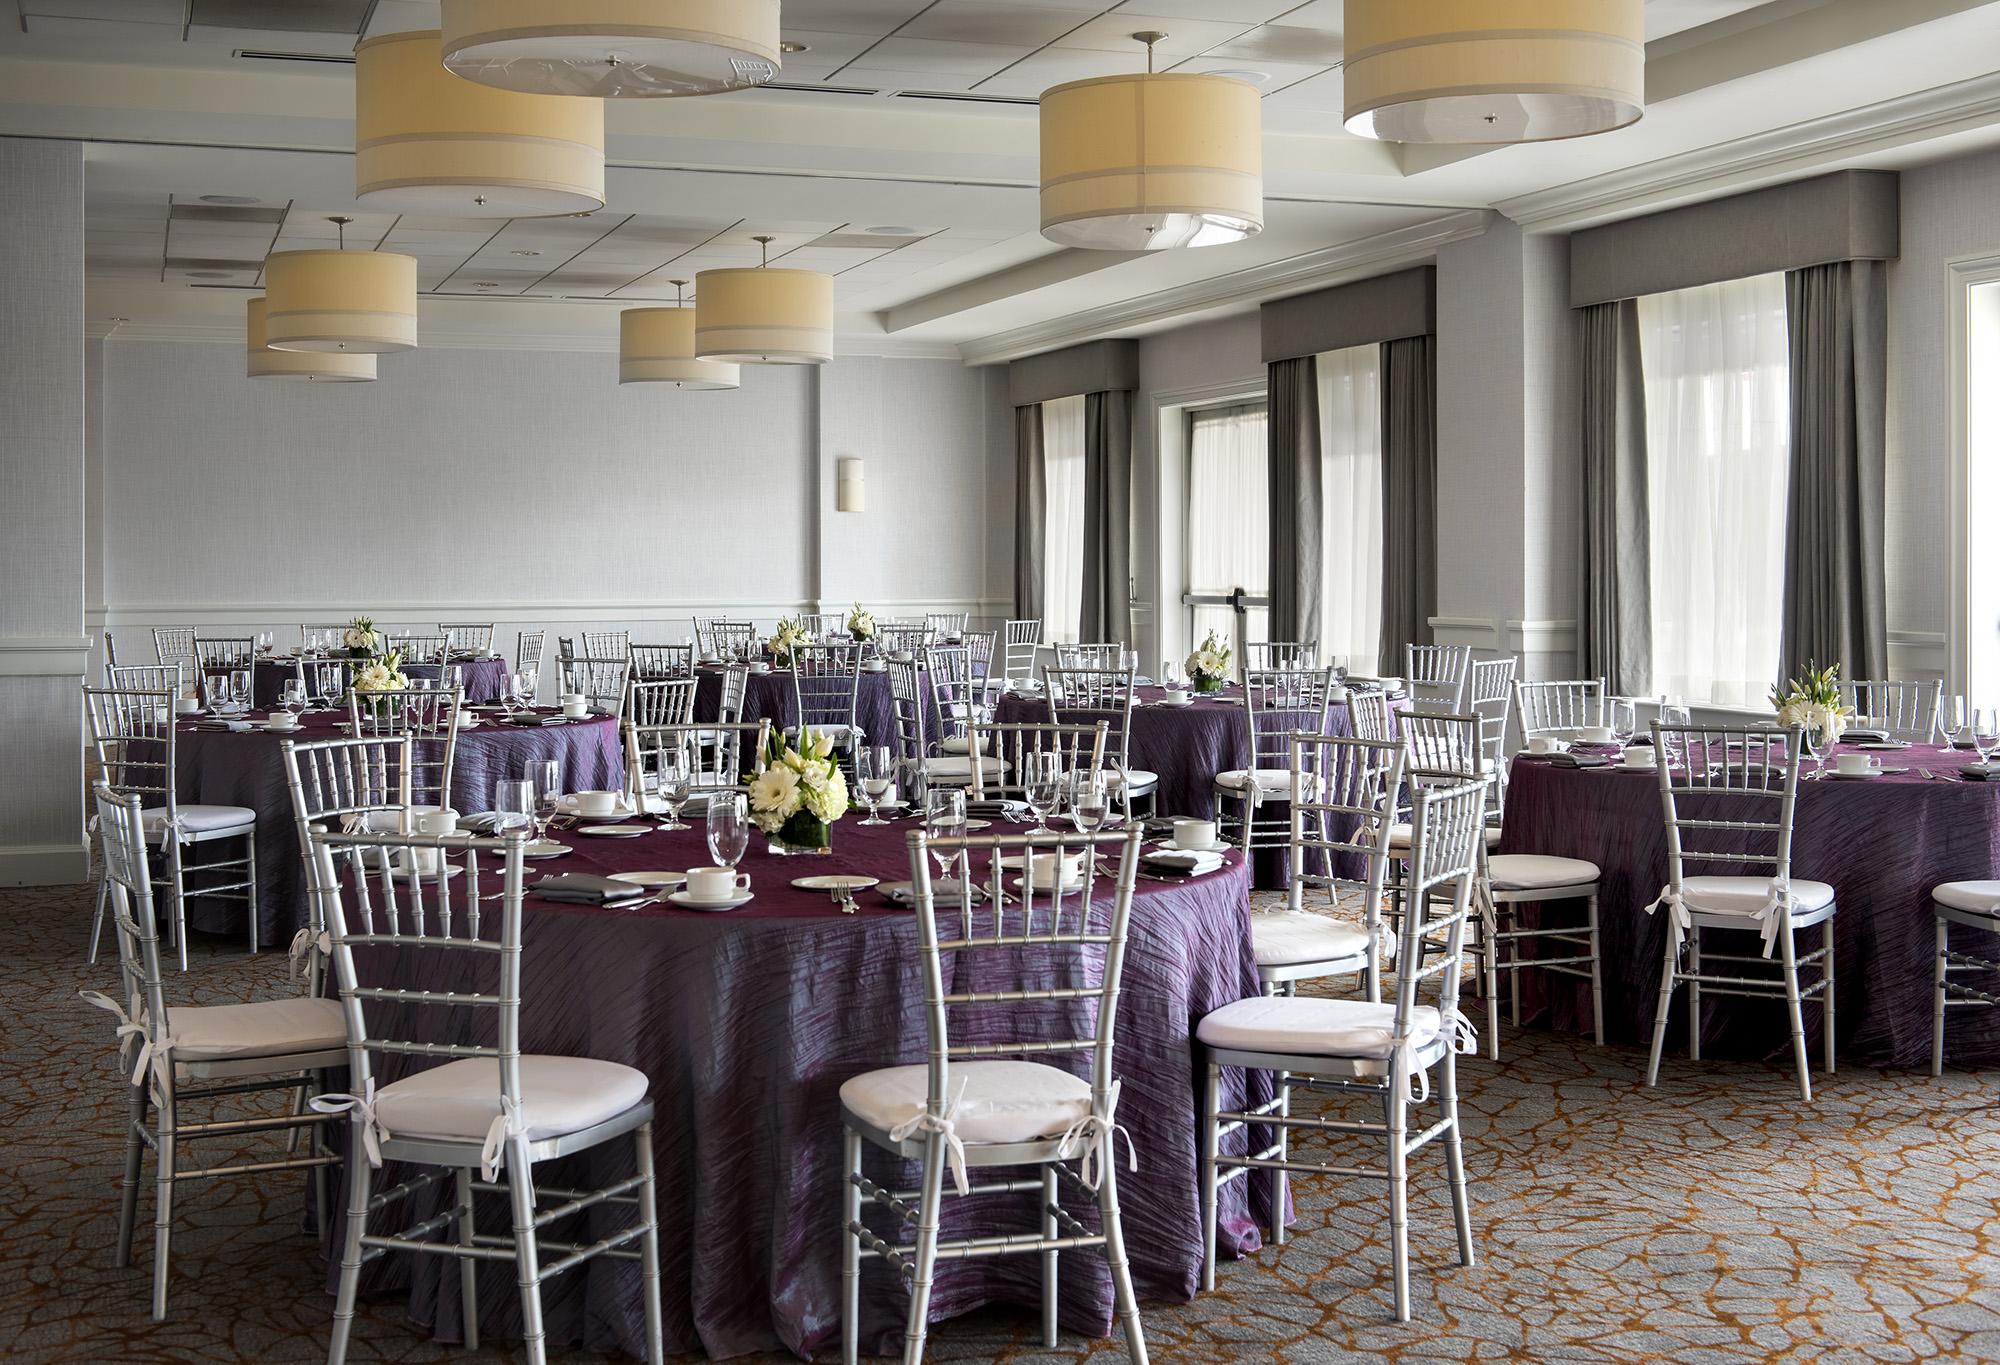 chair cover rentals boston ma blue adirondack victorian lilac taffeta table linen rental tablecloth